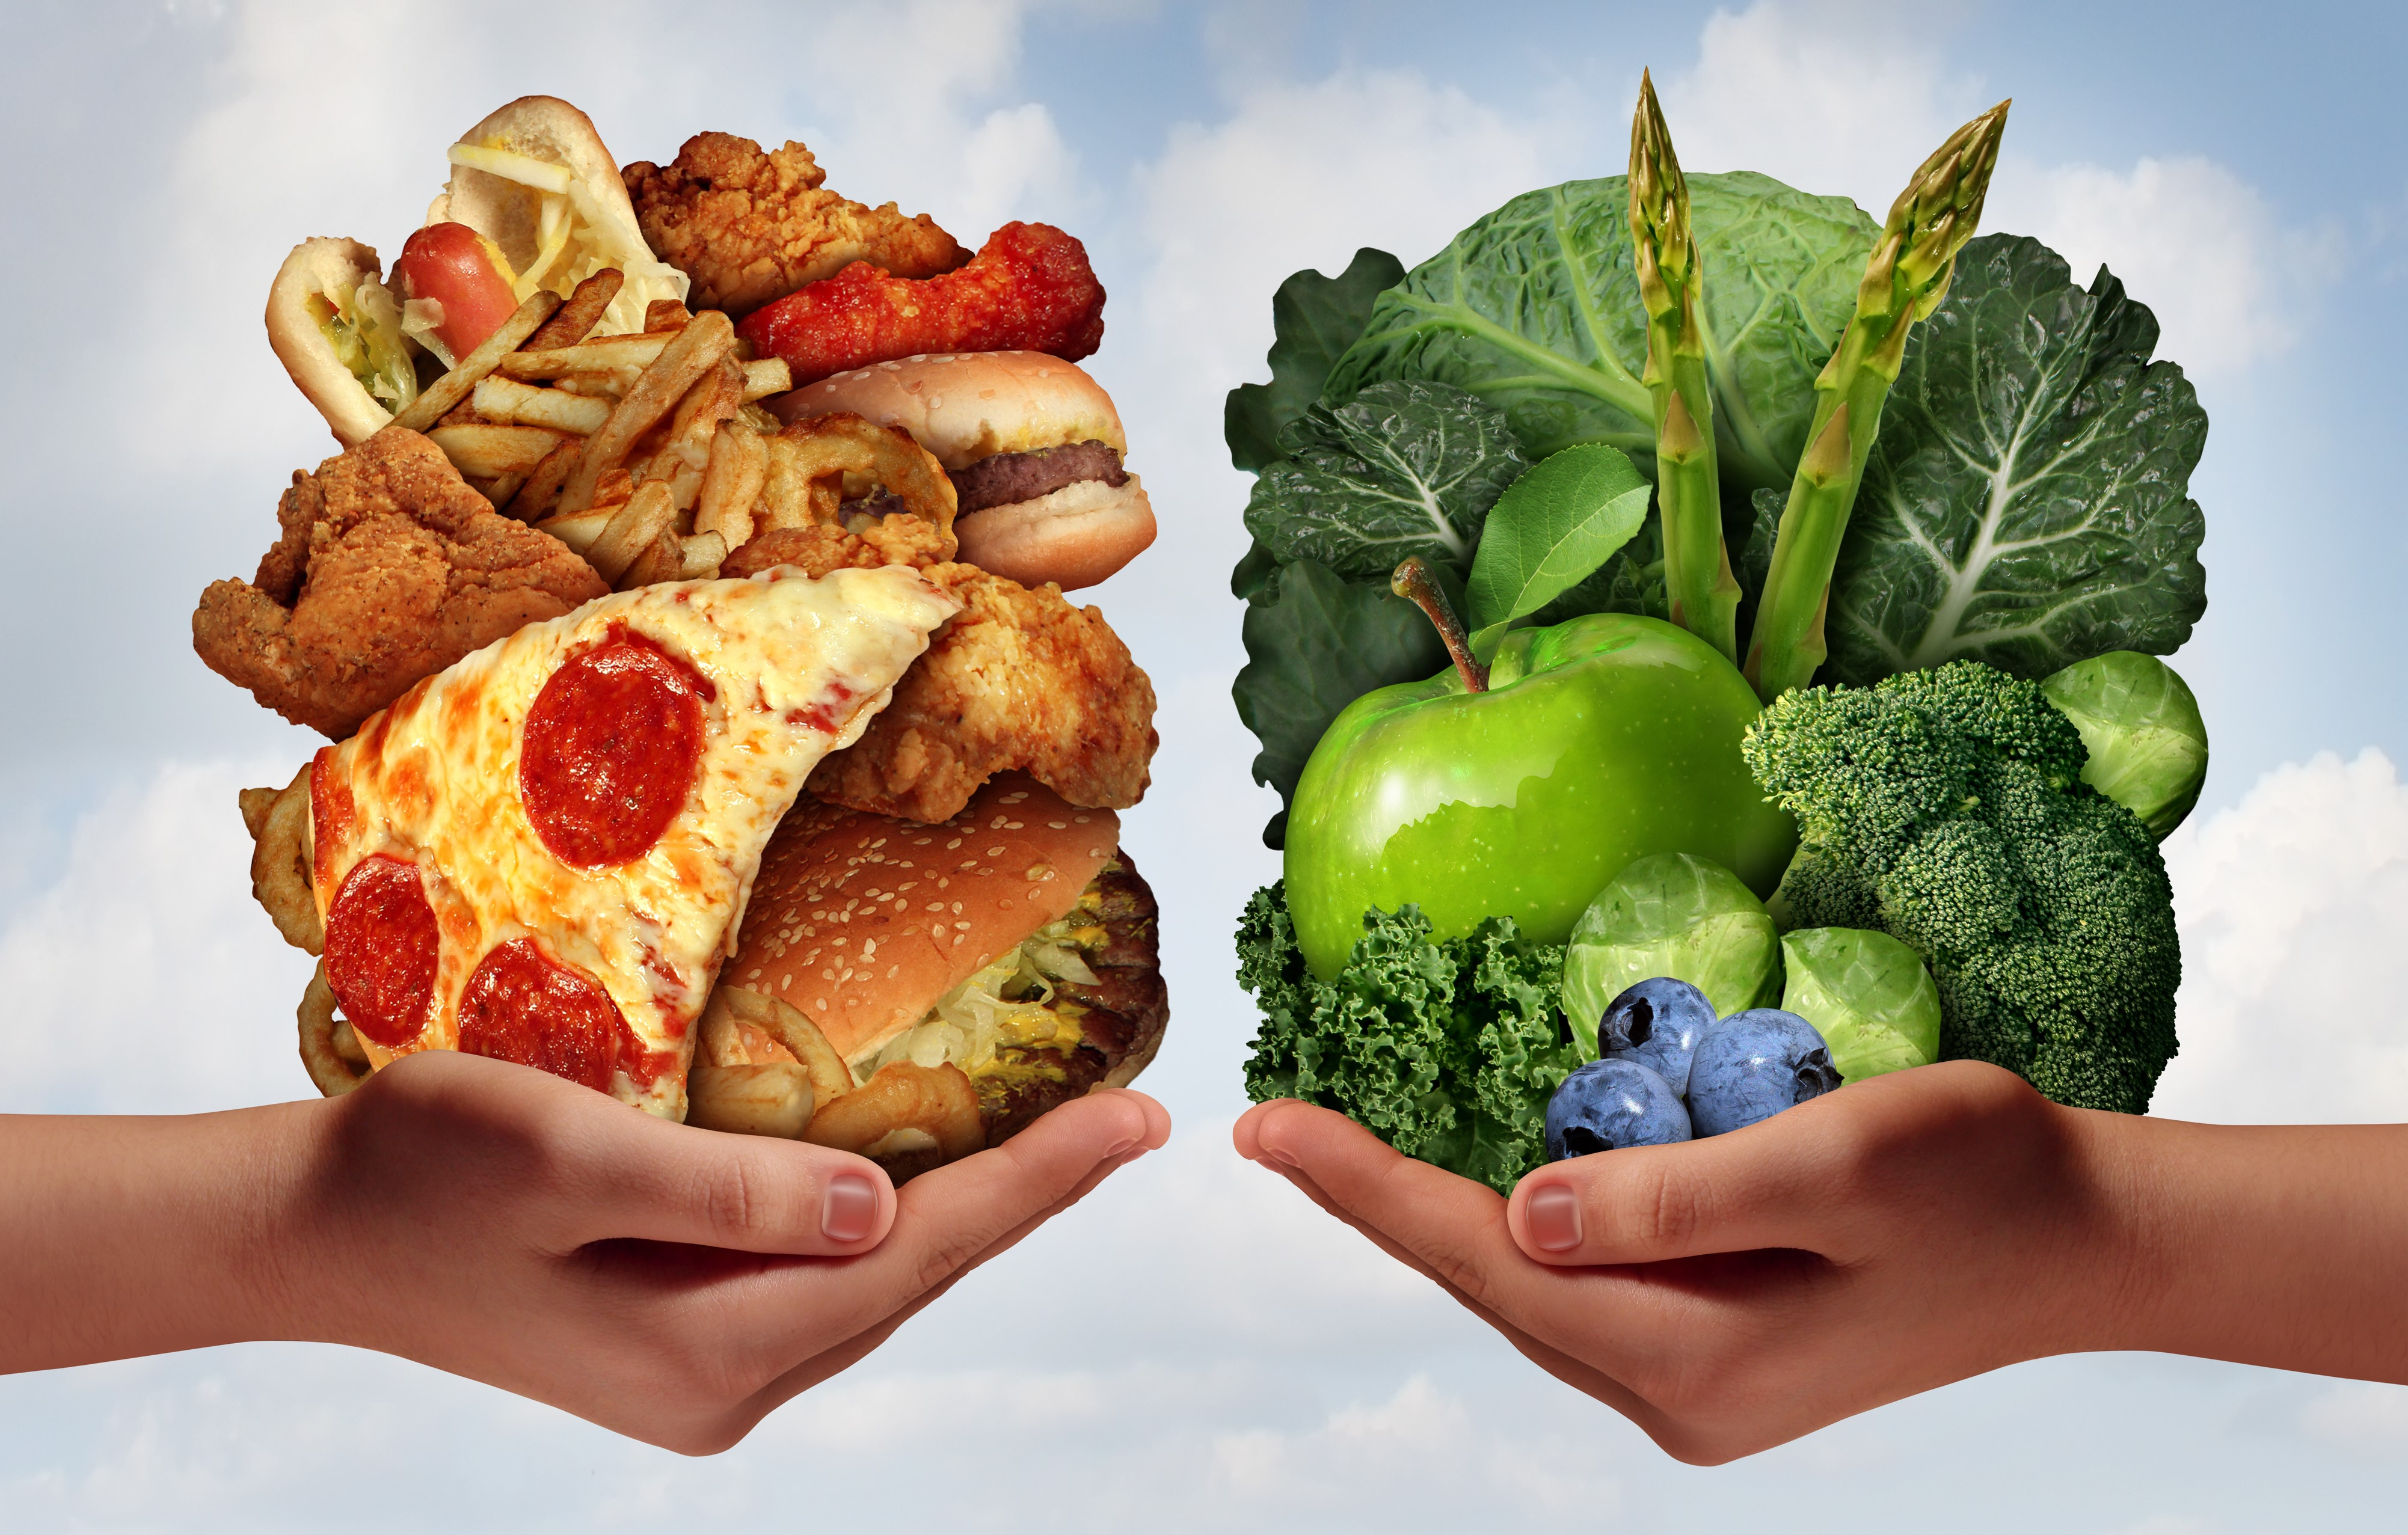 Dietary Intakes